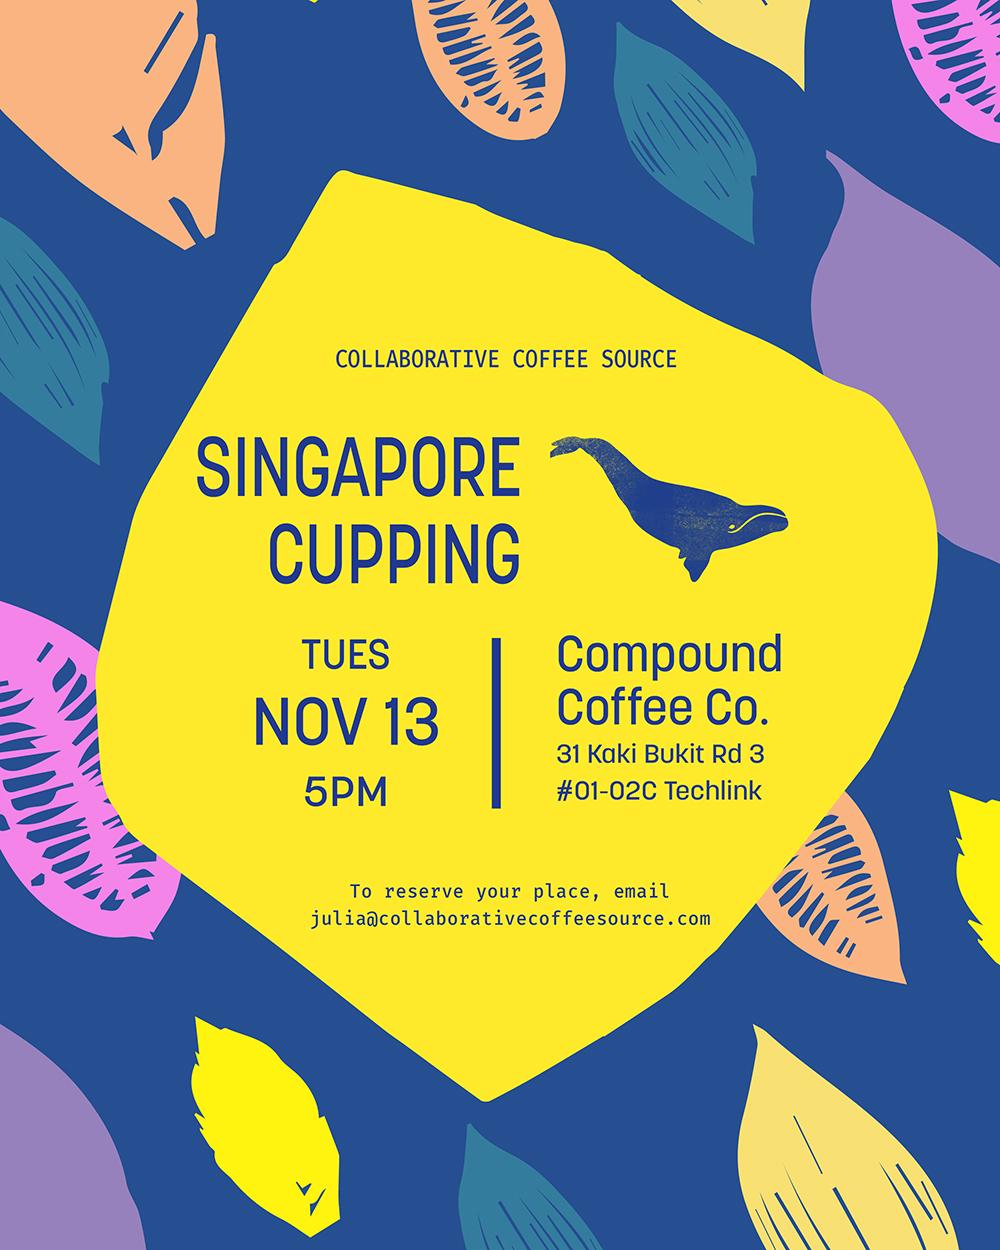 Singapore Cupping sm.jpg